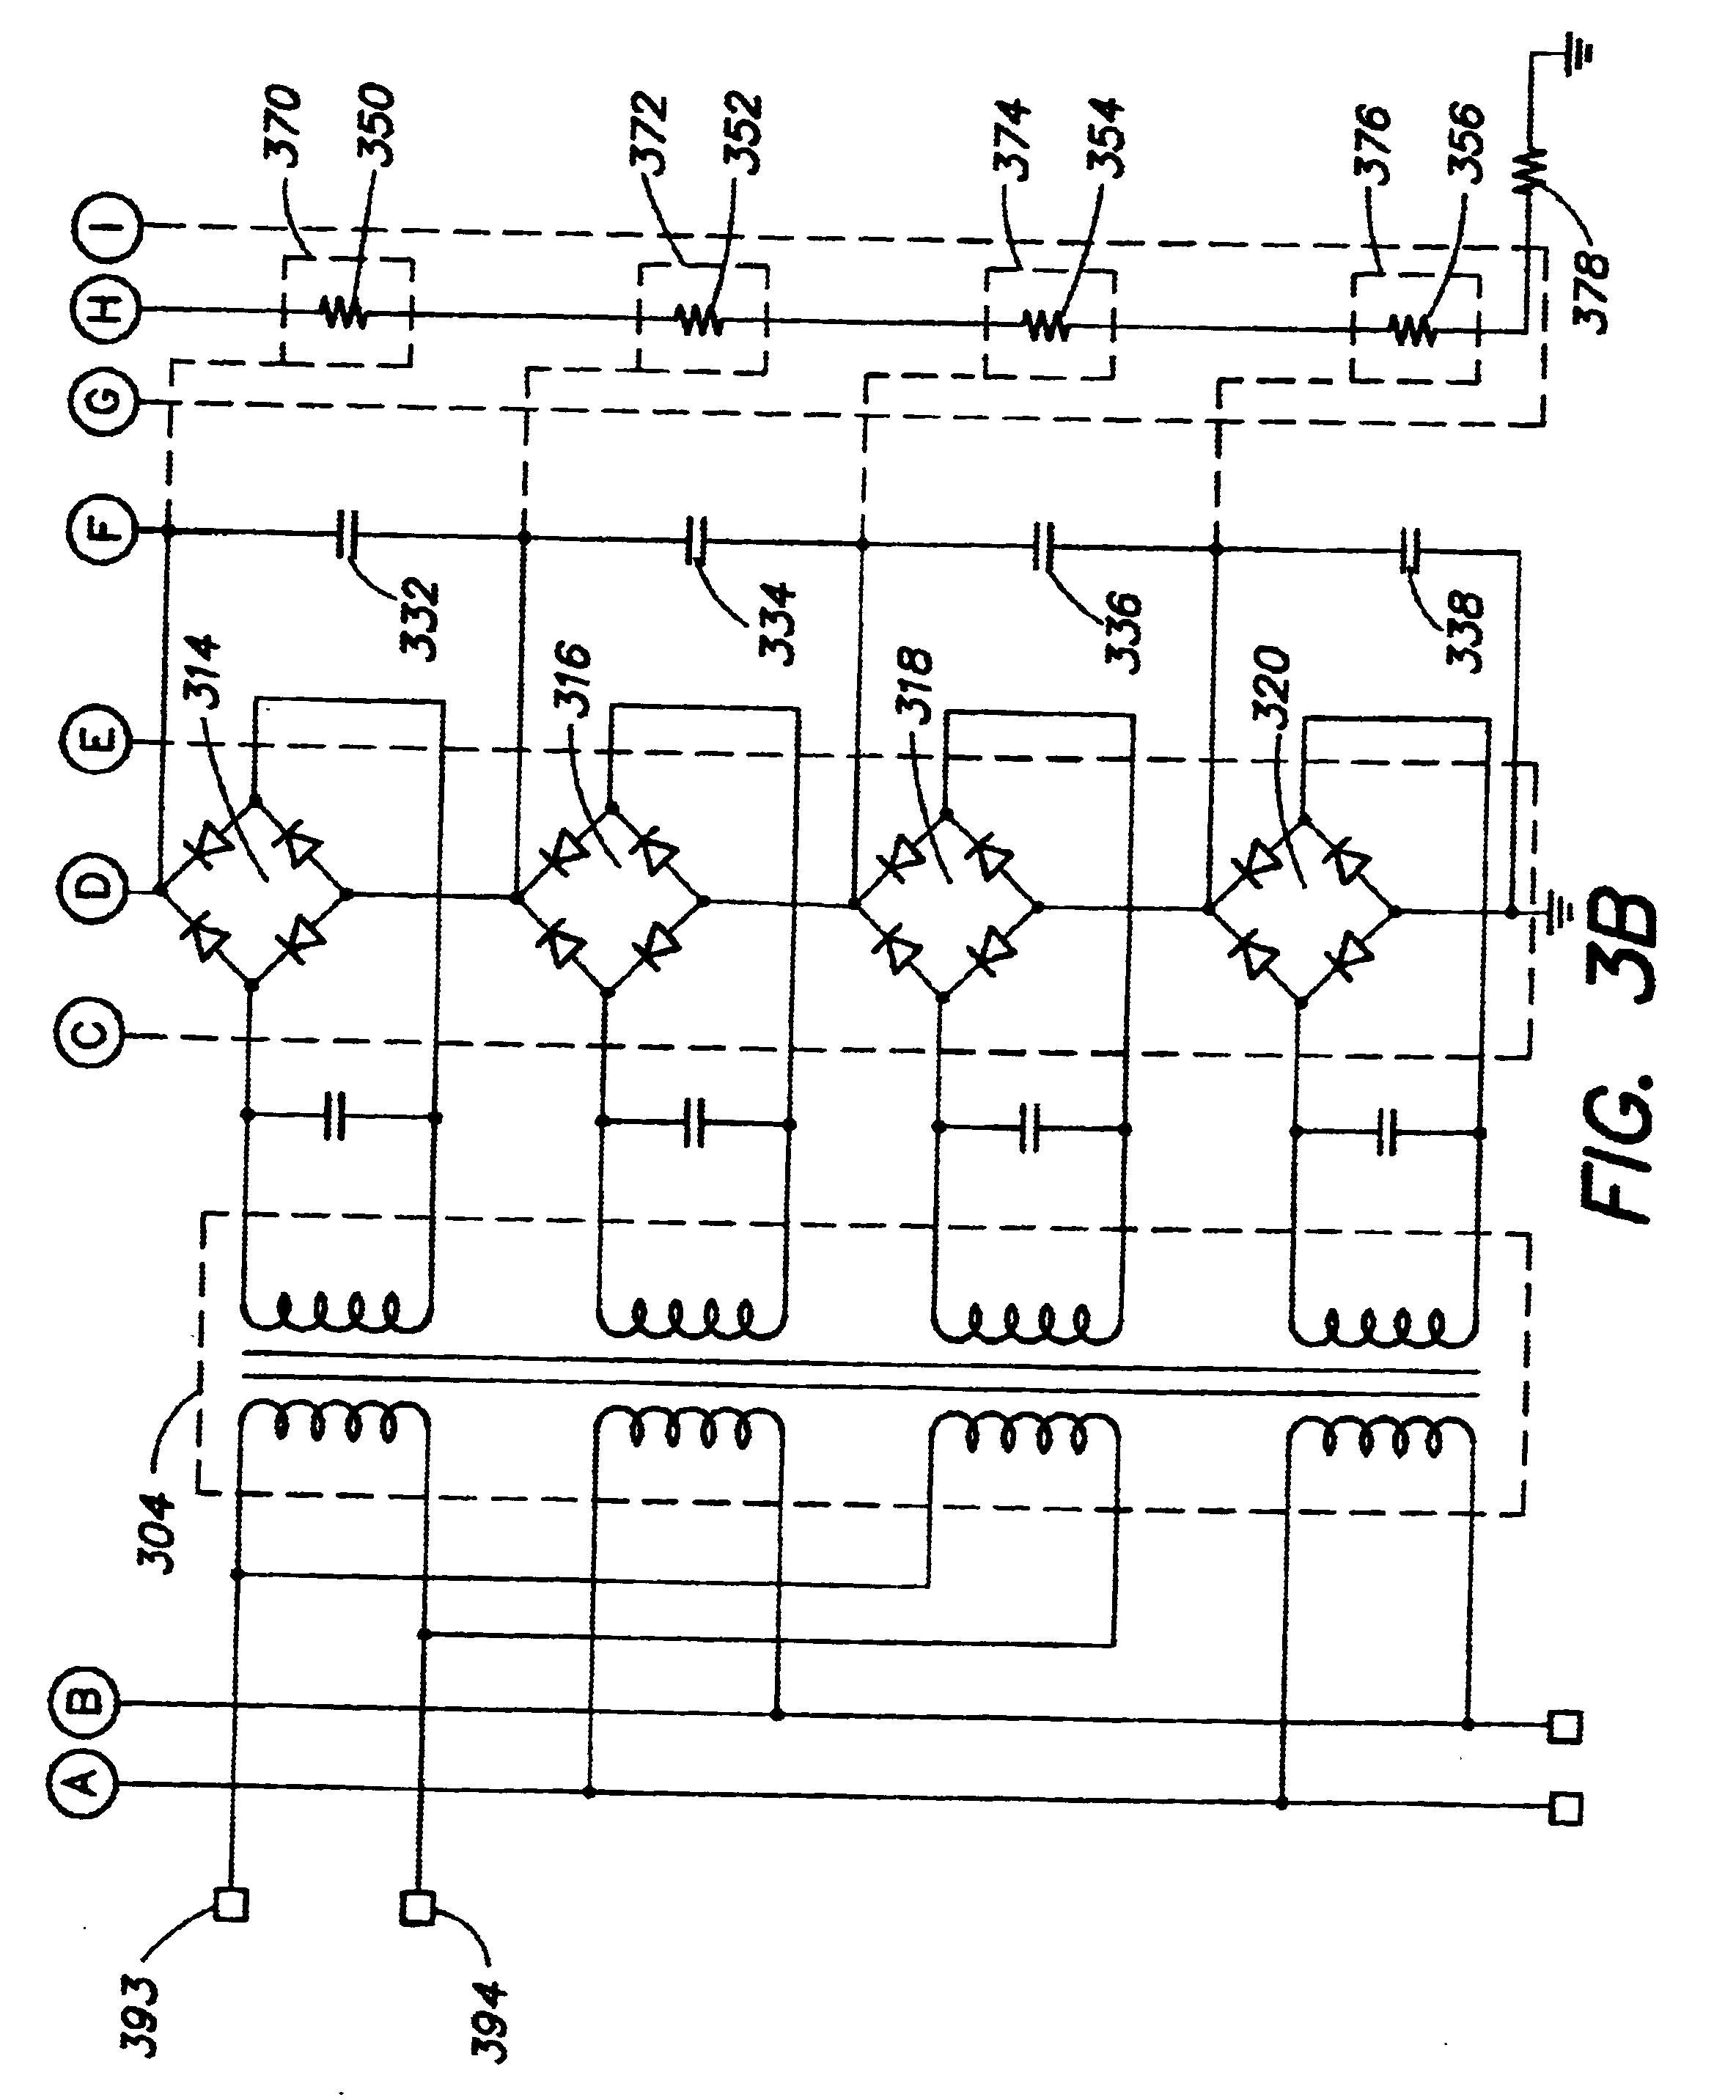 wiring diagram artinya wiring diagram all data Wiring Color Coding wiring diagram artinya wiring diagram database friendship bracelet diagrams blog posts livinplanet classic car wiring diagrams